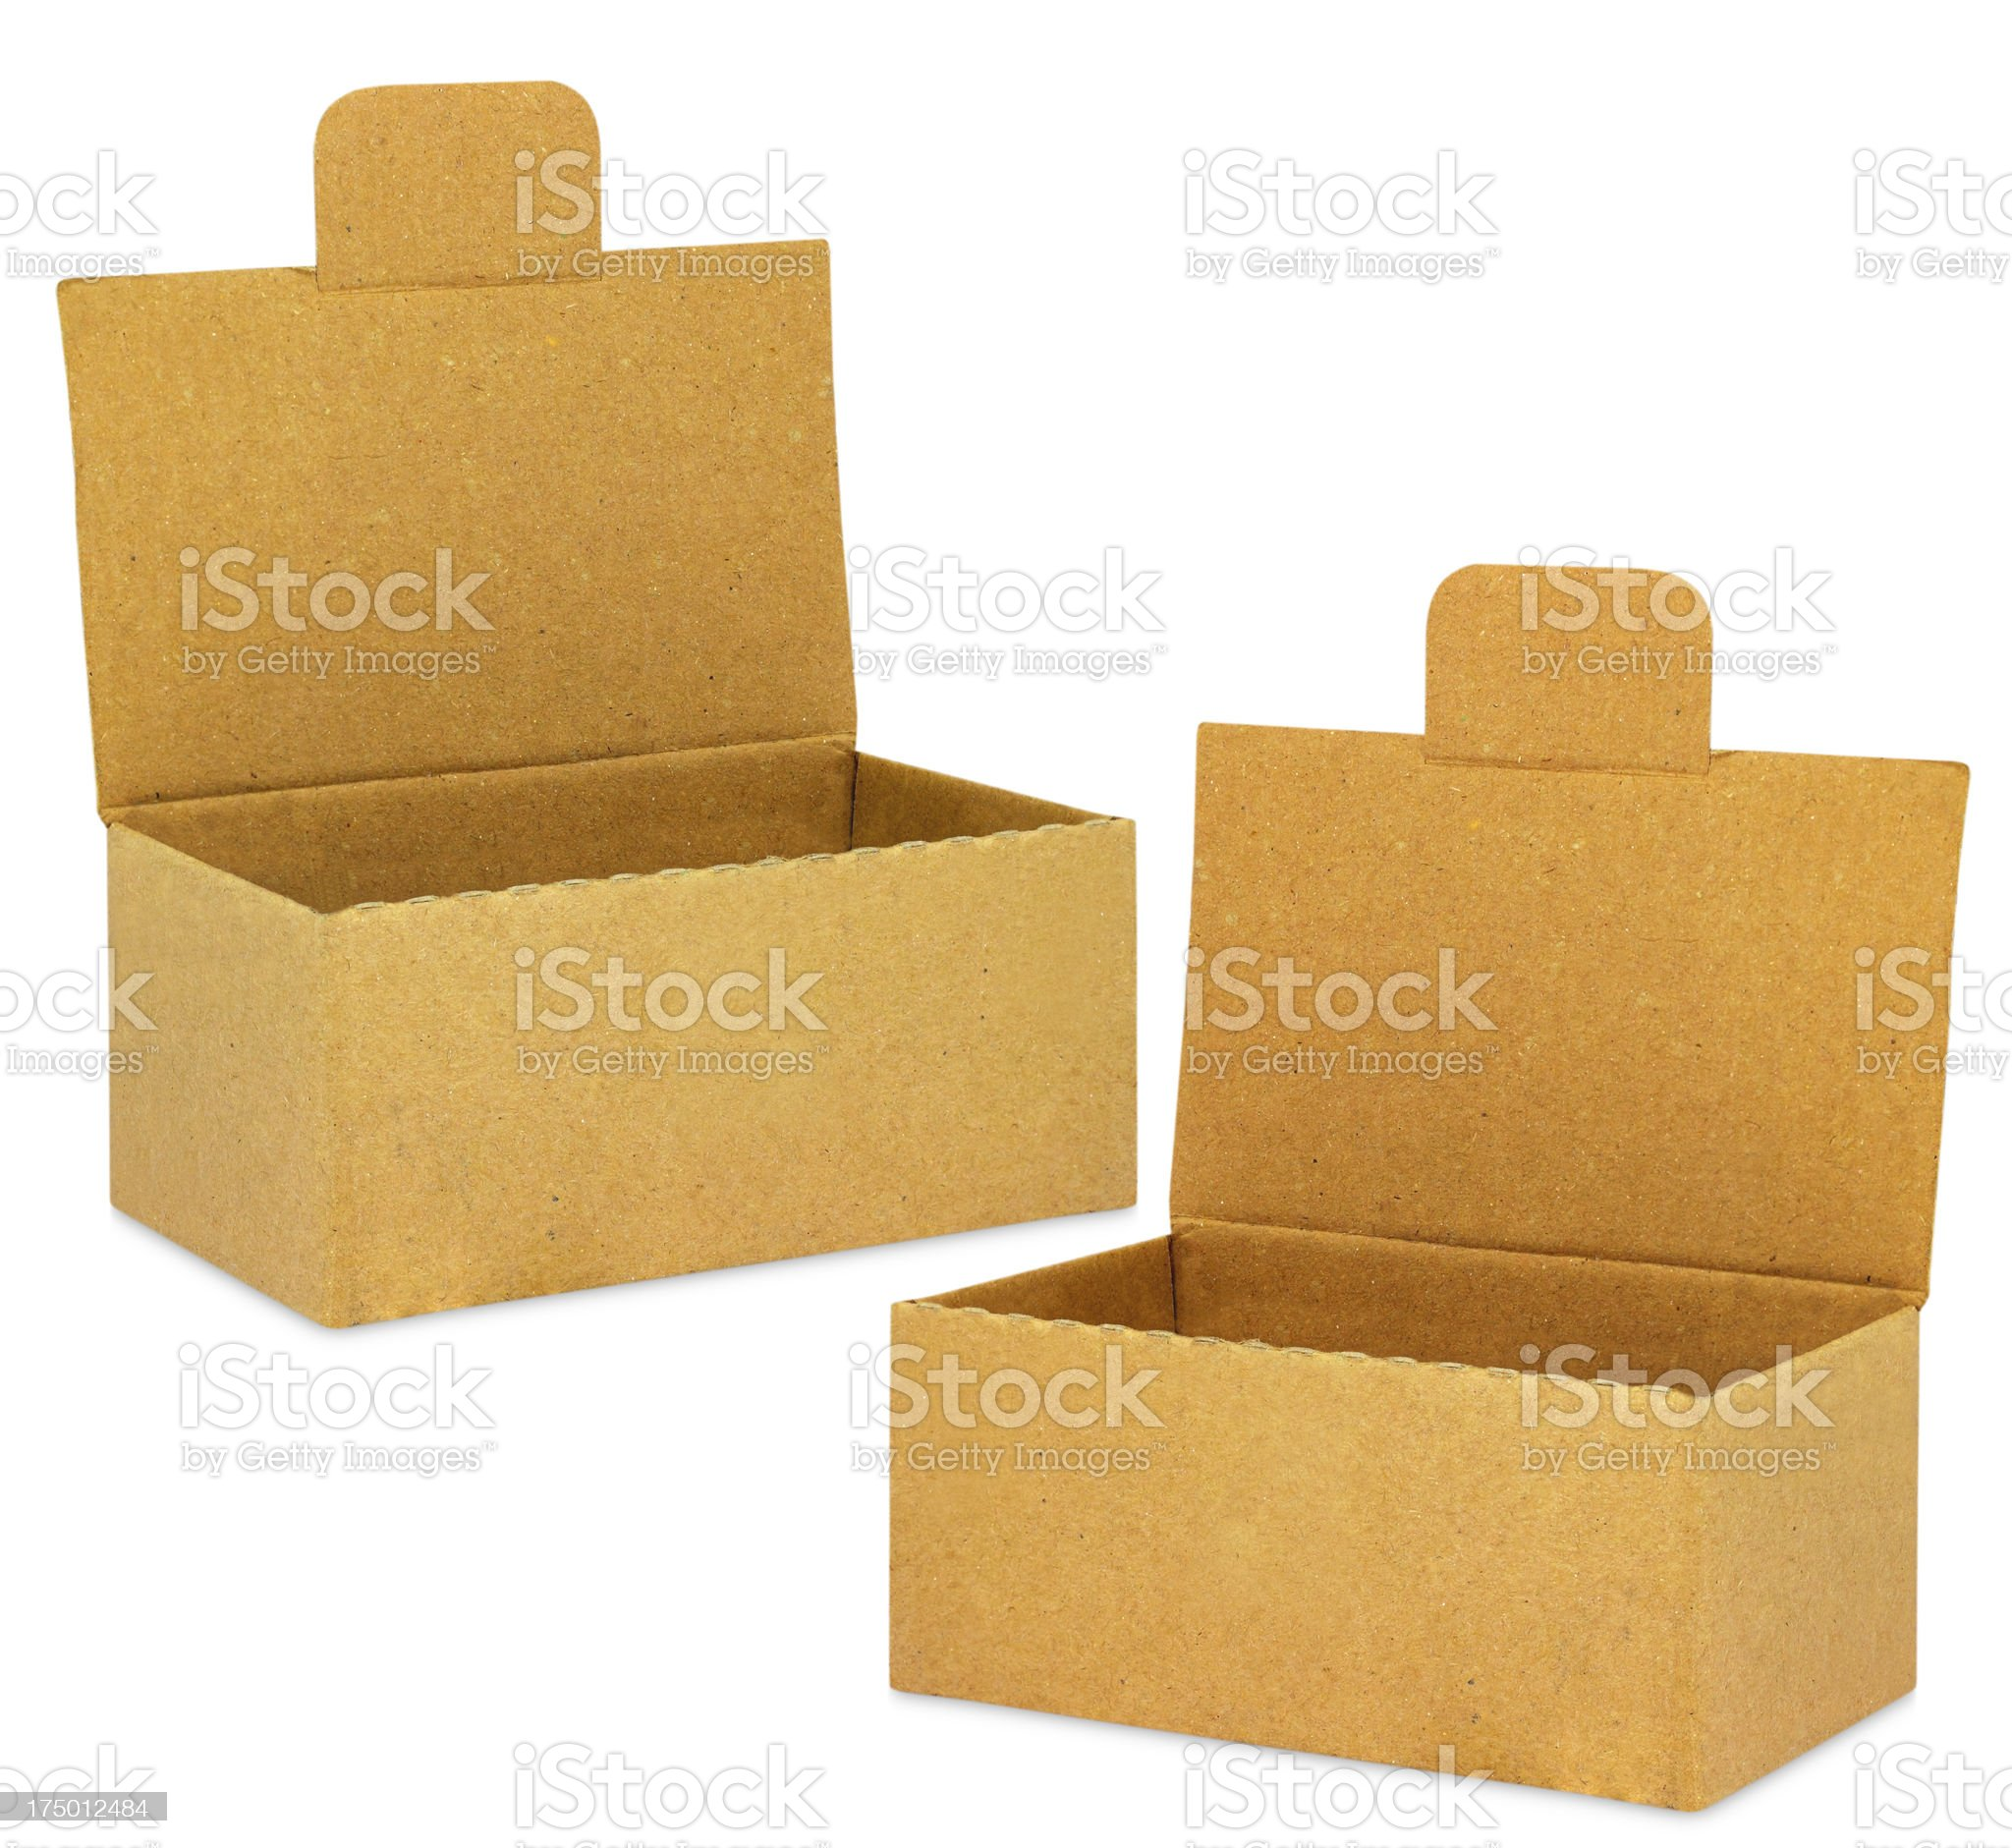 cardboard box on white background royalty-free stock photo